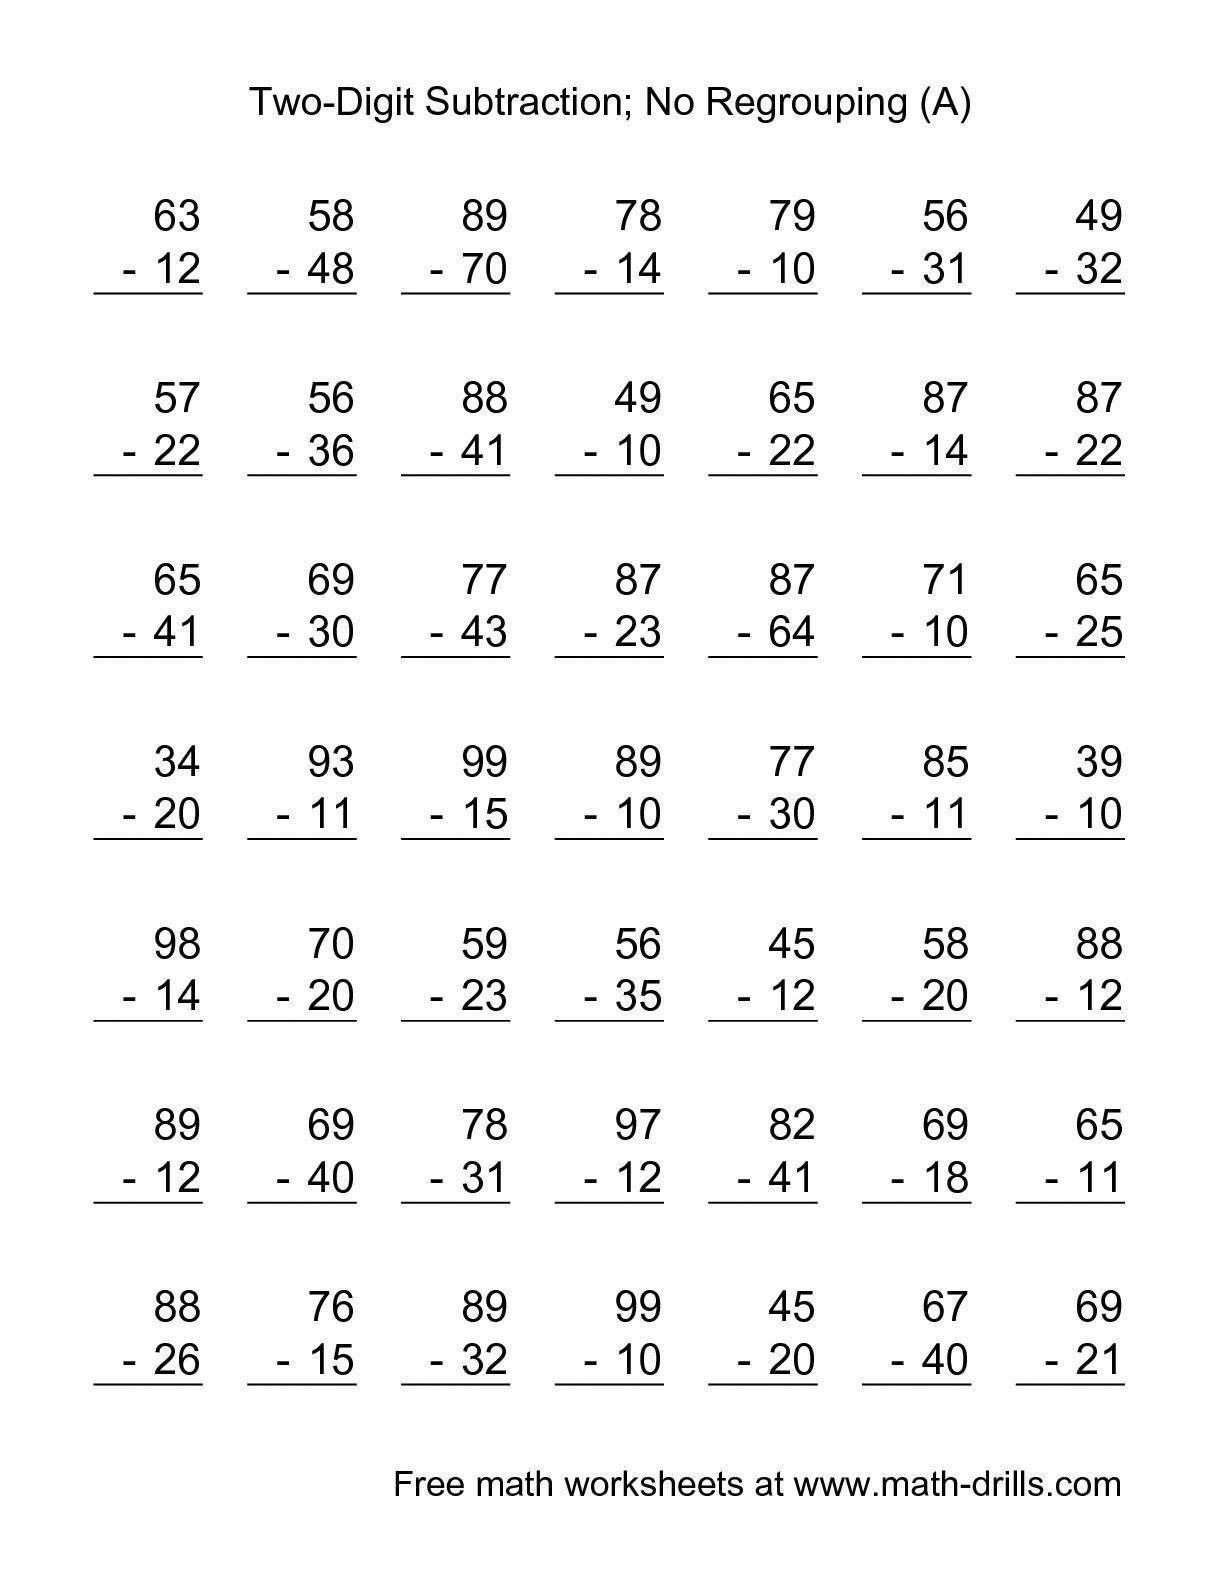 3 Free Math Worksheets Fourth Grade 4 Addition Adding 2